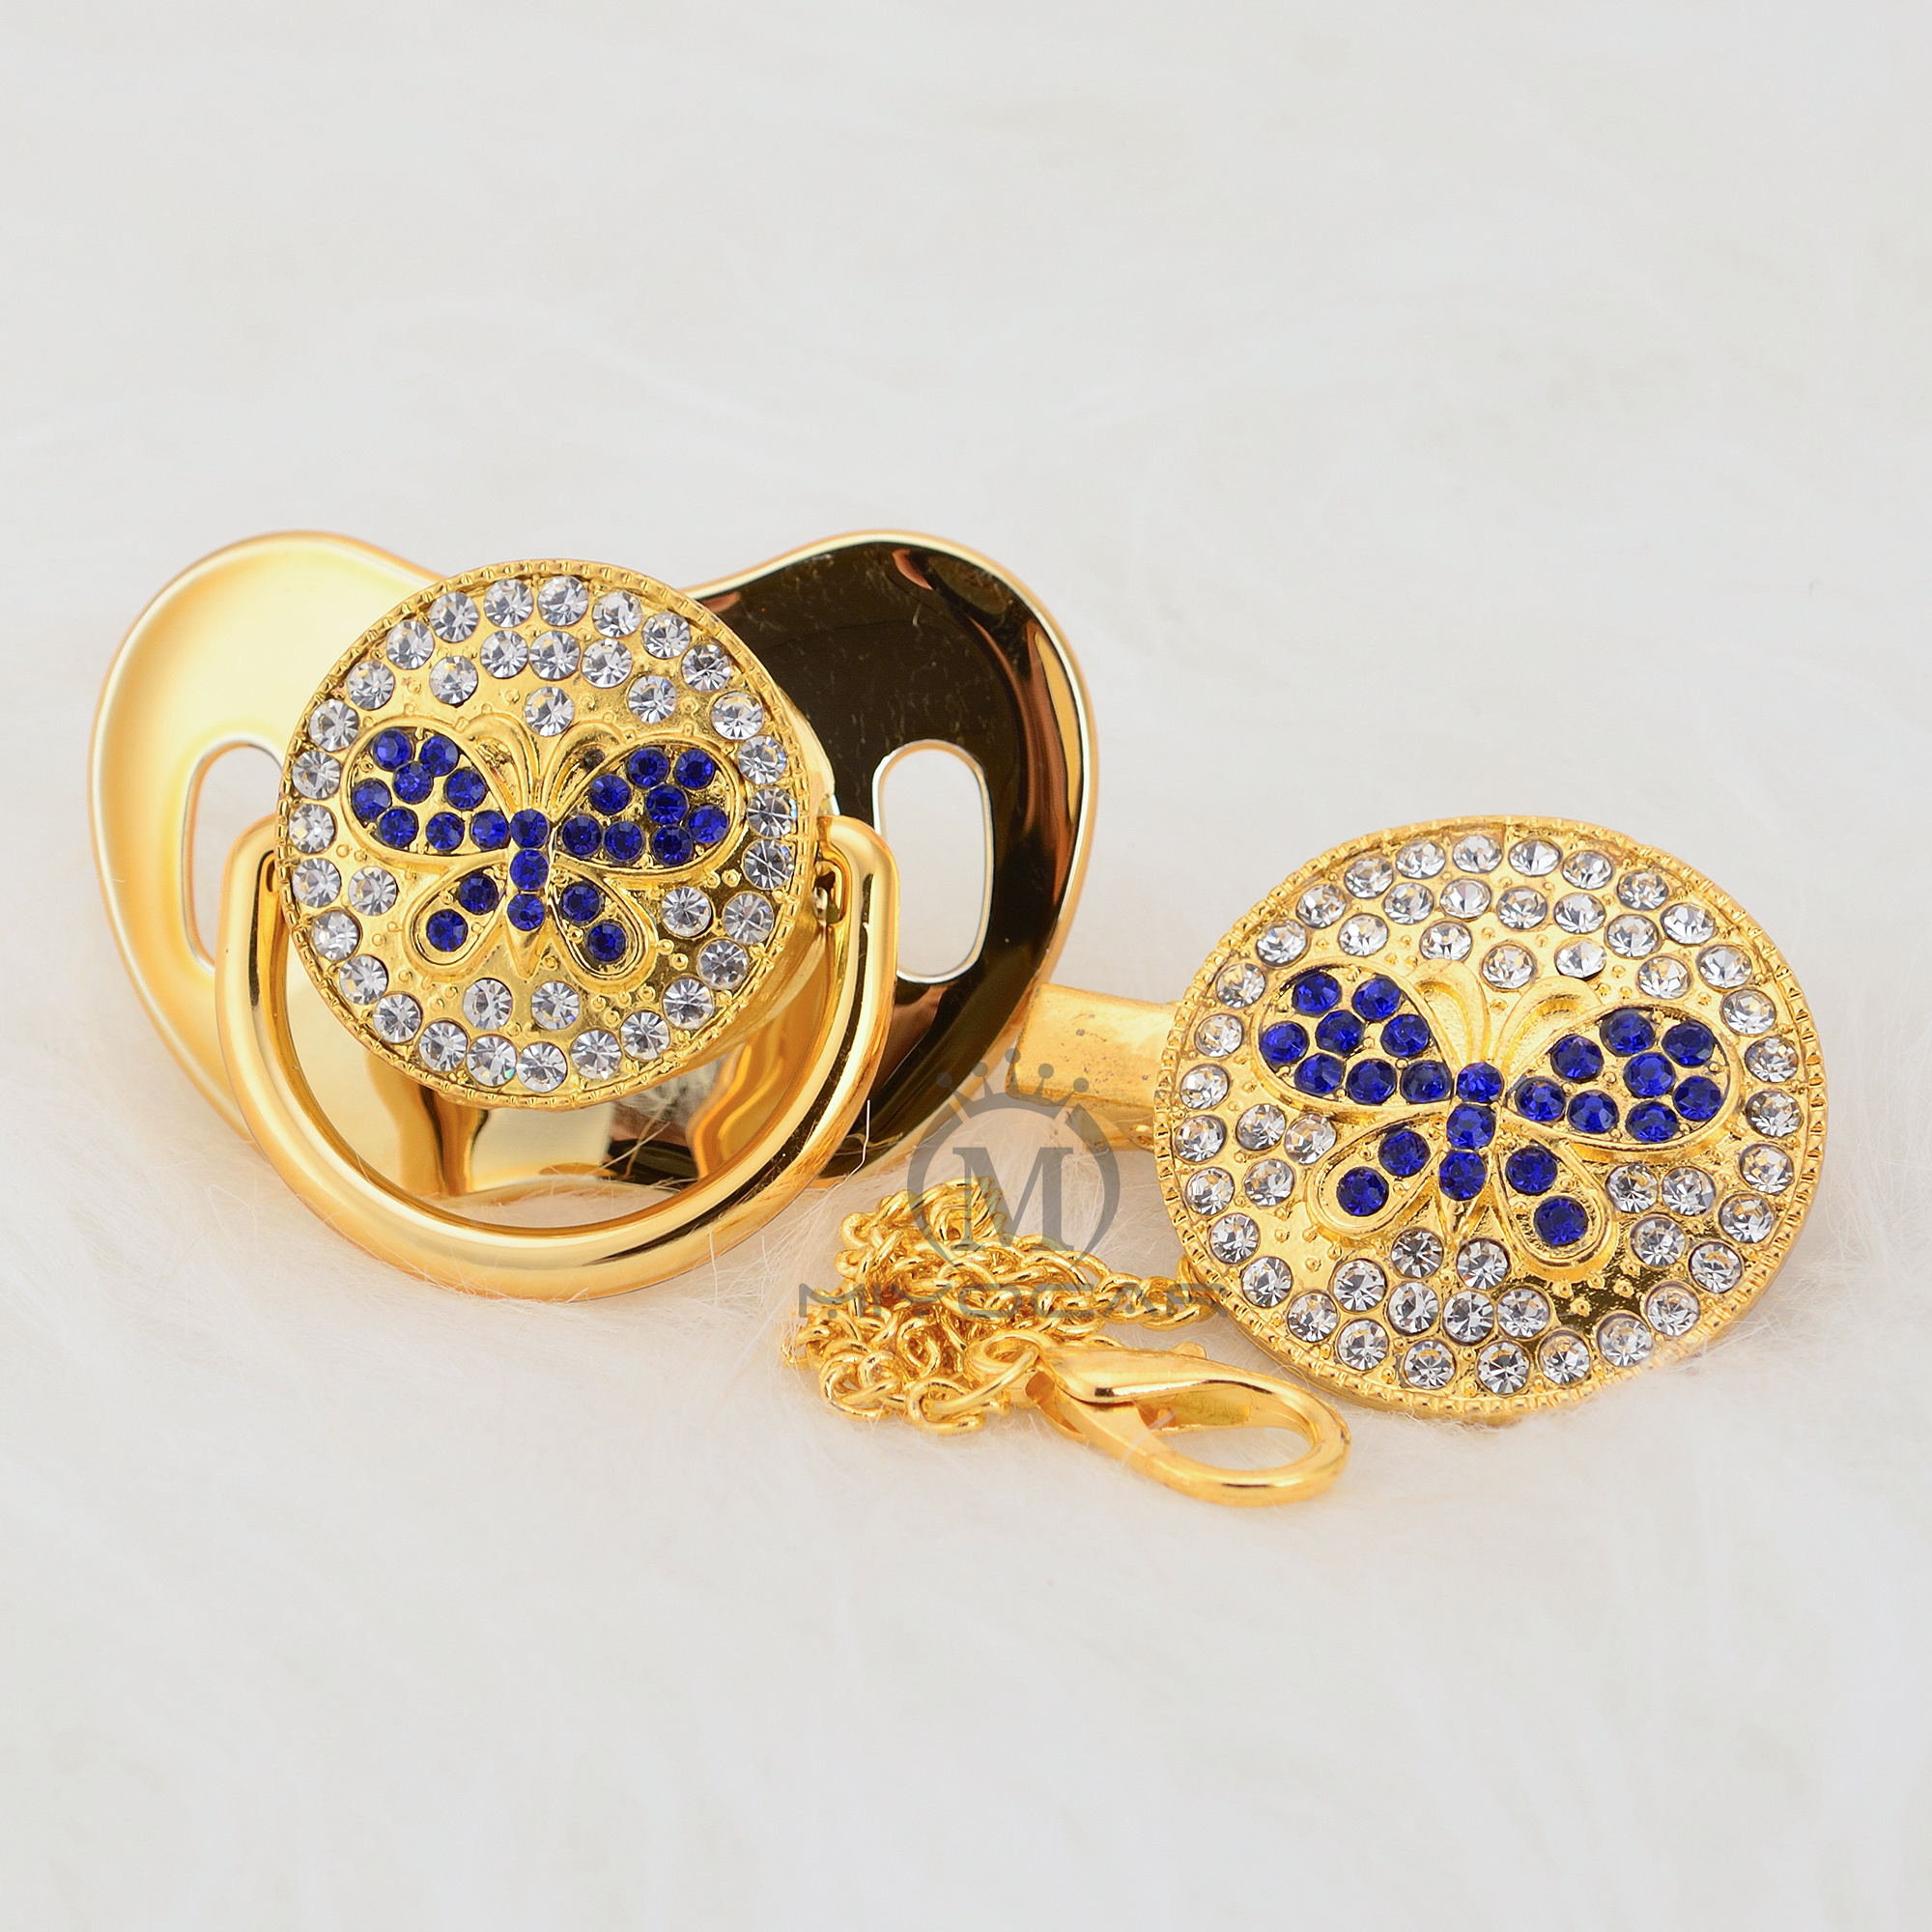 miyocar bling borboleta azul chupeta e clipe set cadeia chupeta chupeta titular bling borboleta projeto original